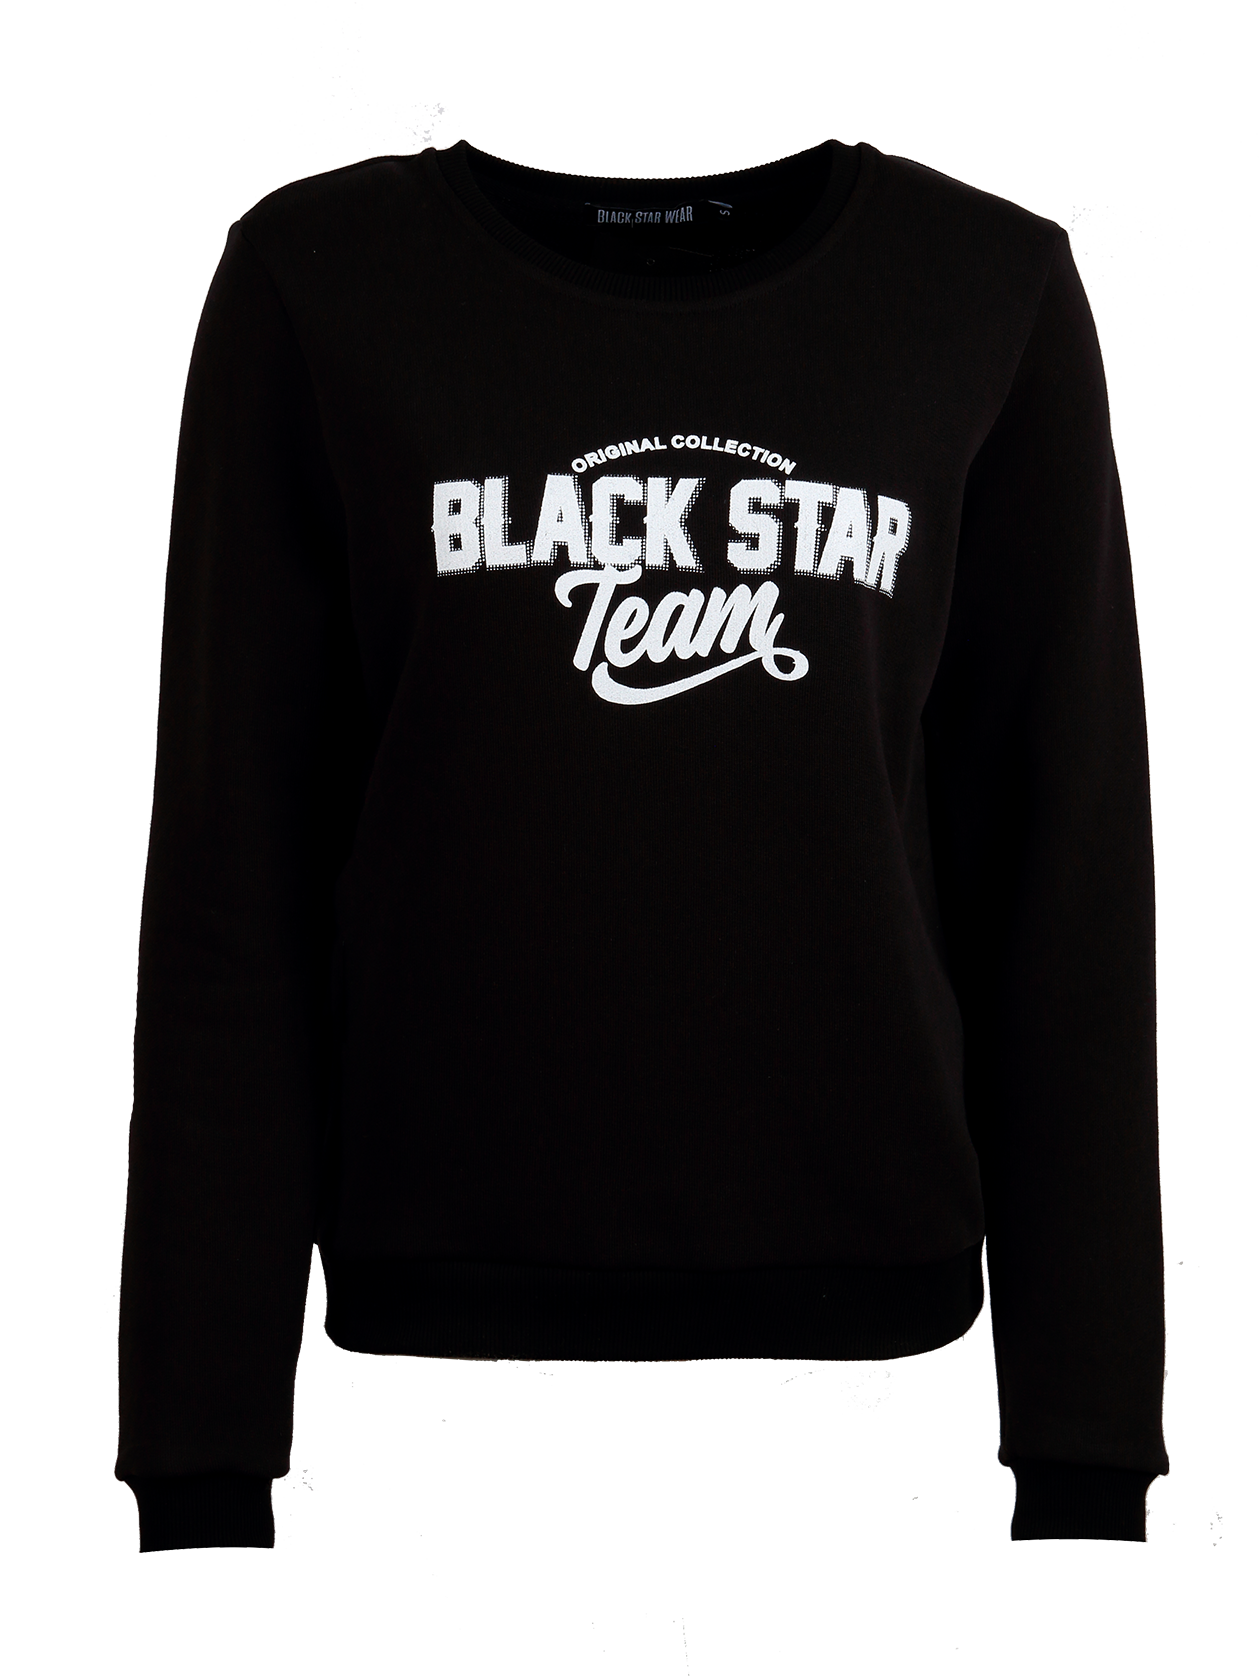 Костюм спортивный женский Black Star Team от Black Star Wear